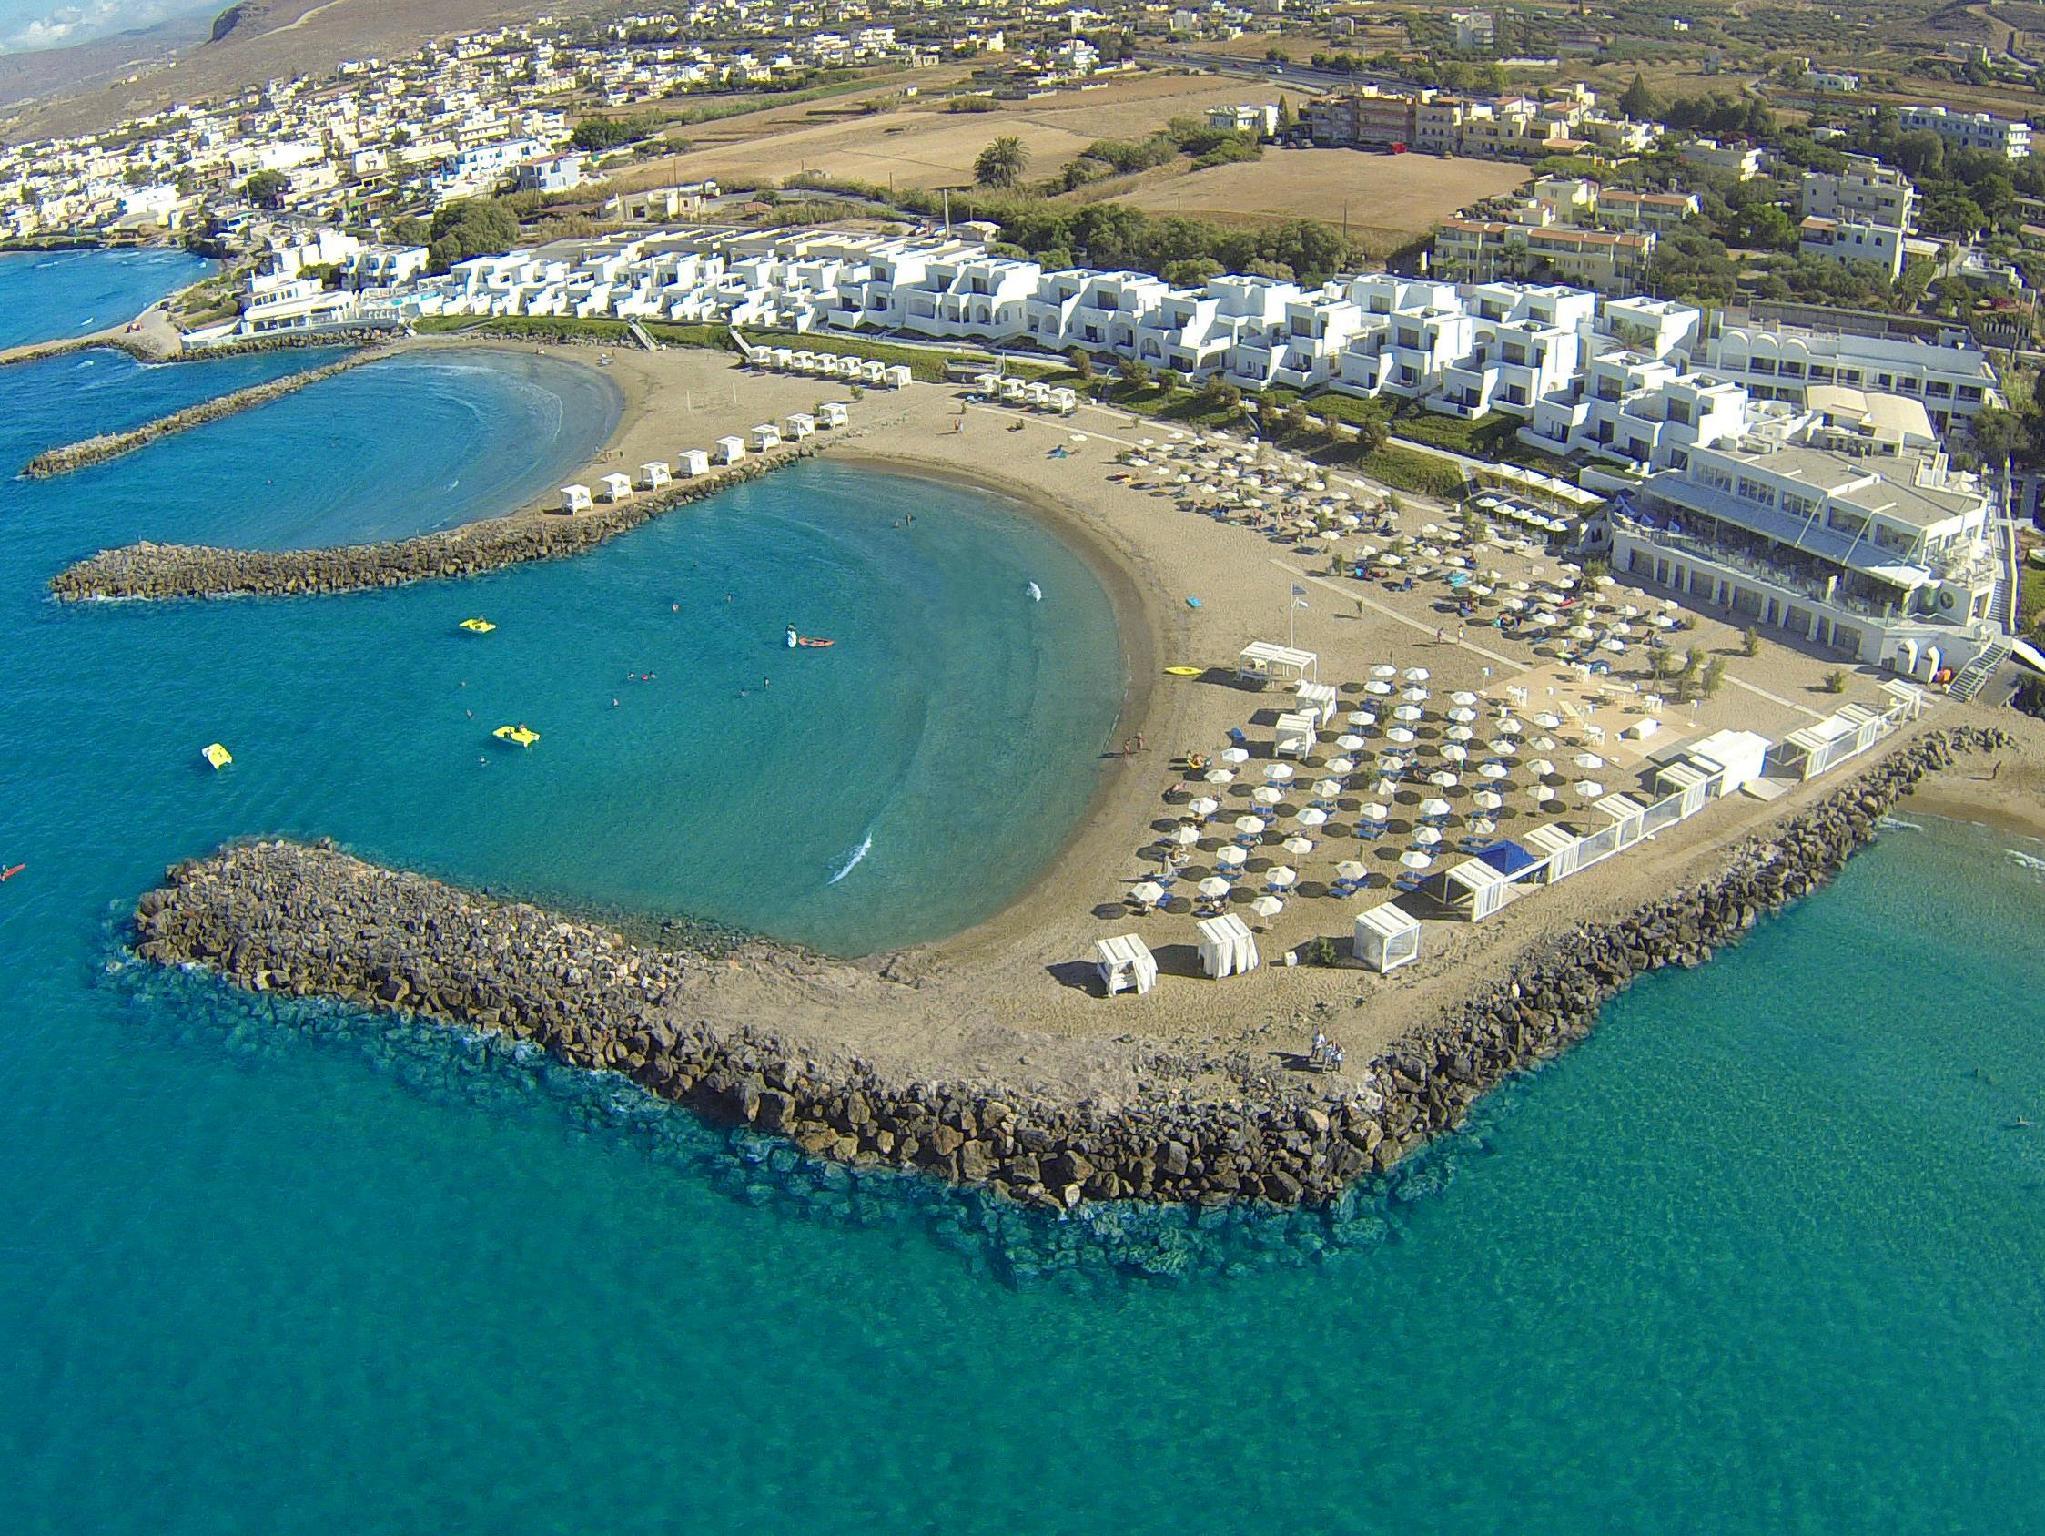 Knossos Beach Bungalows & Suites Hotel - Crete Island